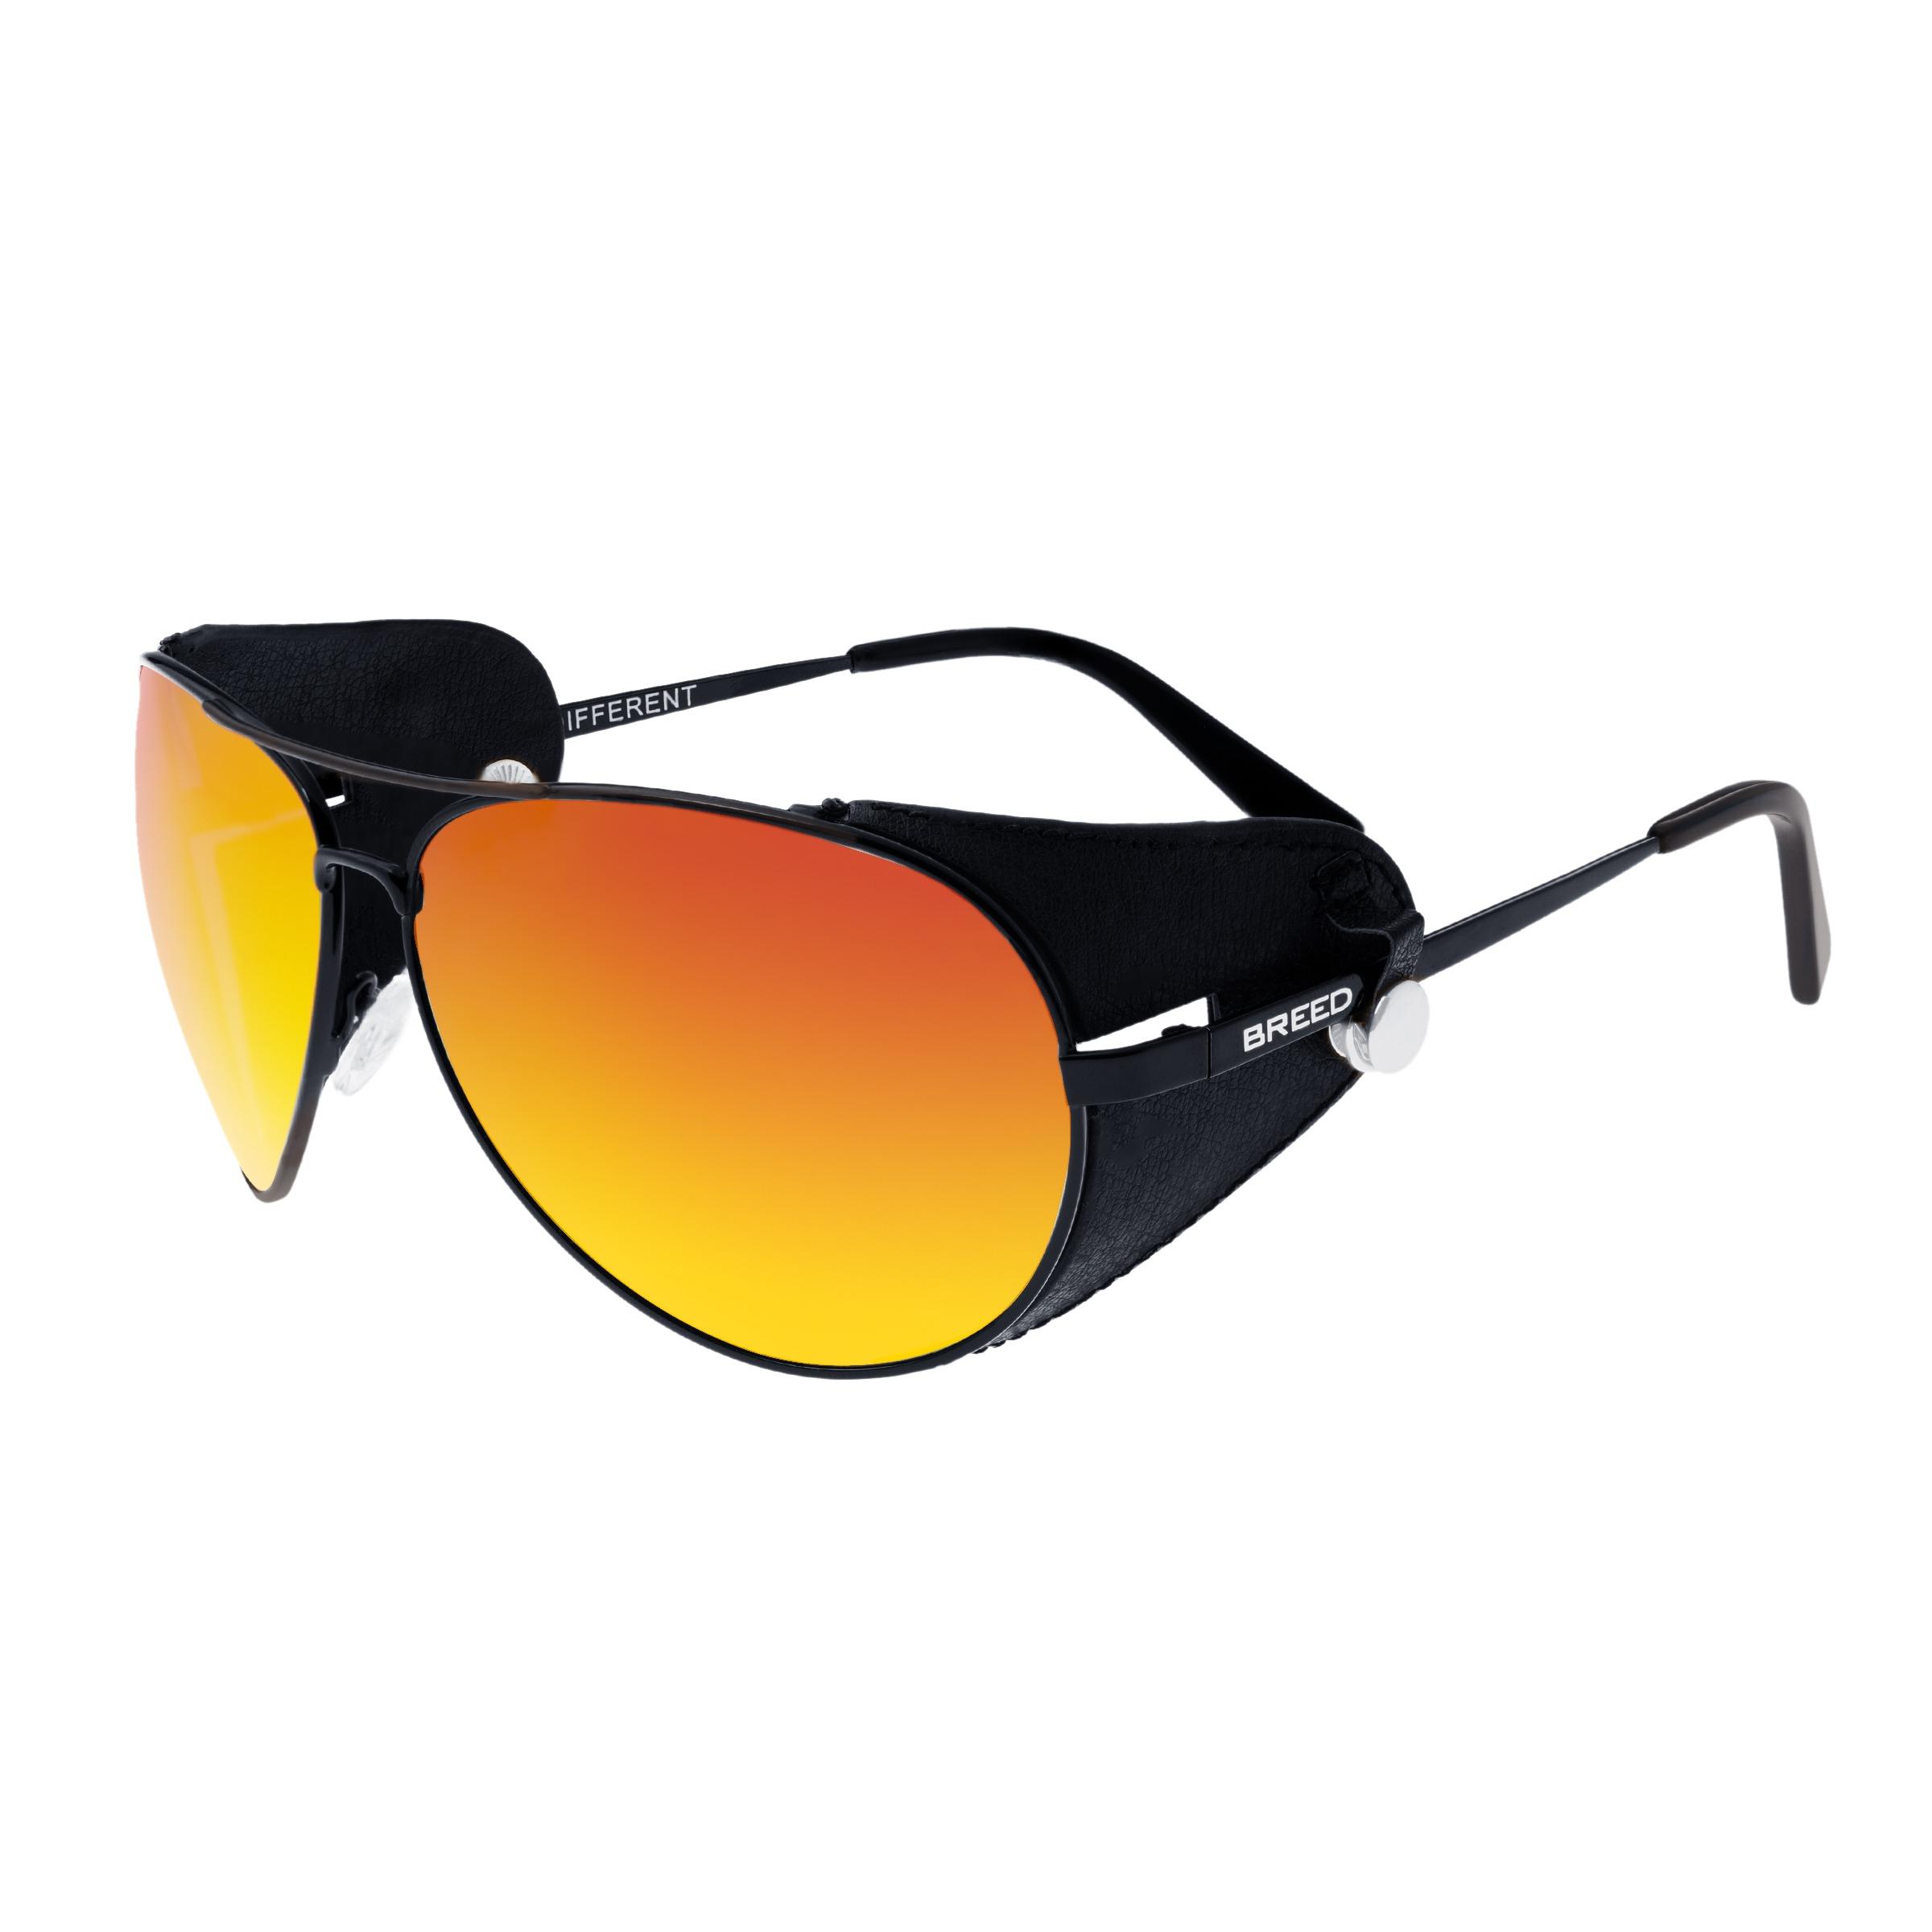 a44cf1f8cb Breed Sunglasses Eclipse Sunglasses FREE S H BSG048BK